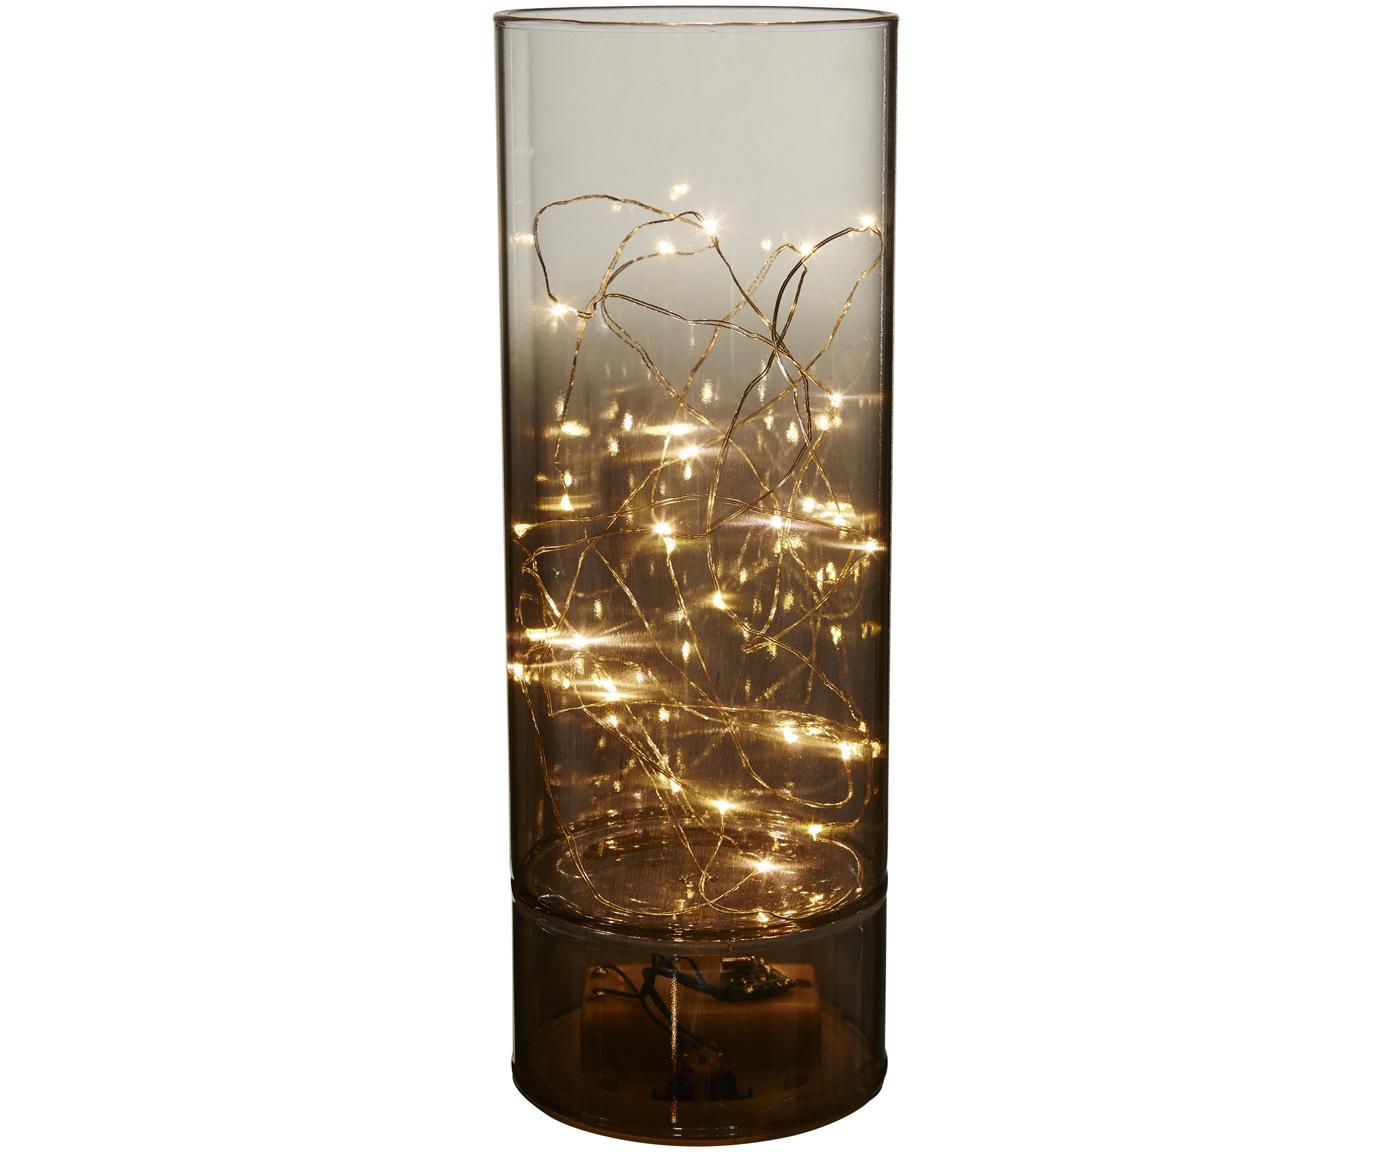 Lámpara decorativa Mirror Tube, Lámpara: vidrio, Parte inferior: metal, recubierto, Gris, Ø 9 x Al 25 cm